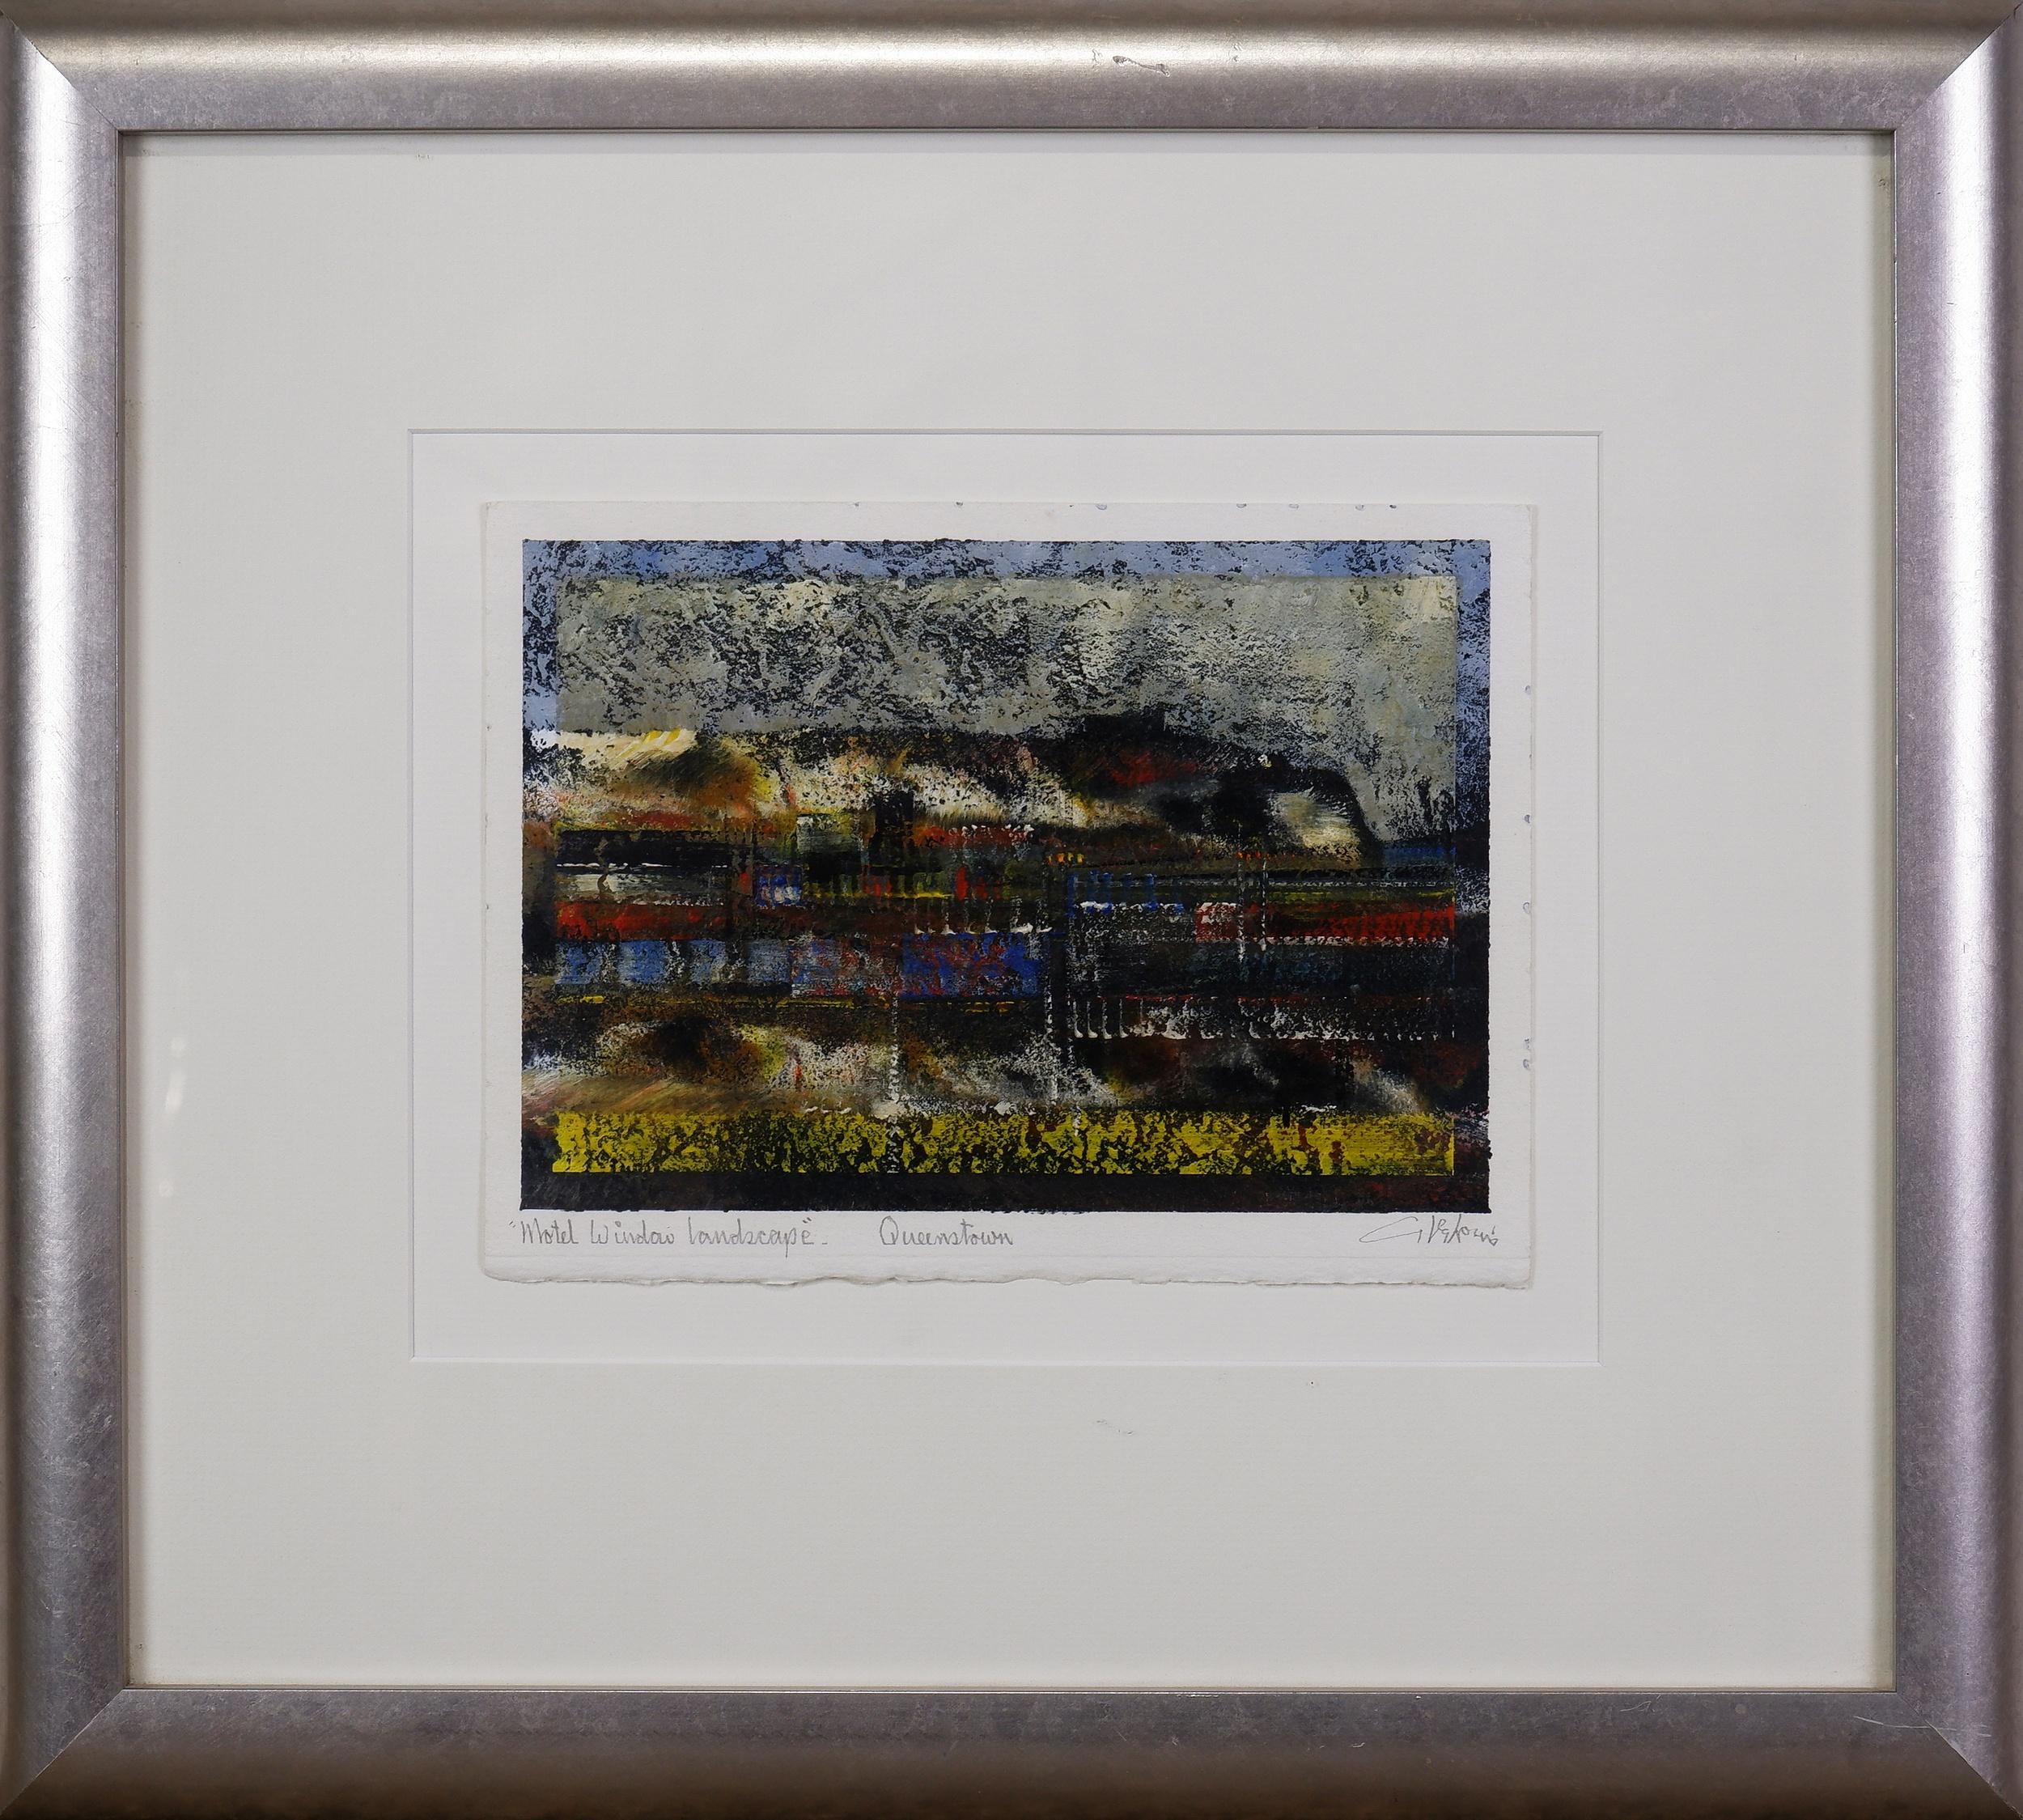 'Tom Gleghorn (born 1925), Motel Window Landscape, Queenstown, Tasmania 1996, Mixed Media on Paper'